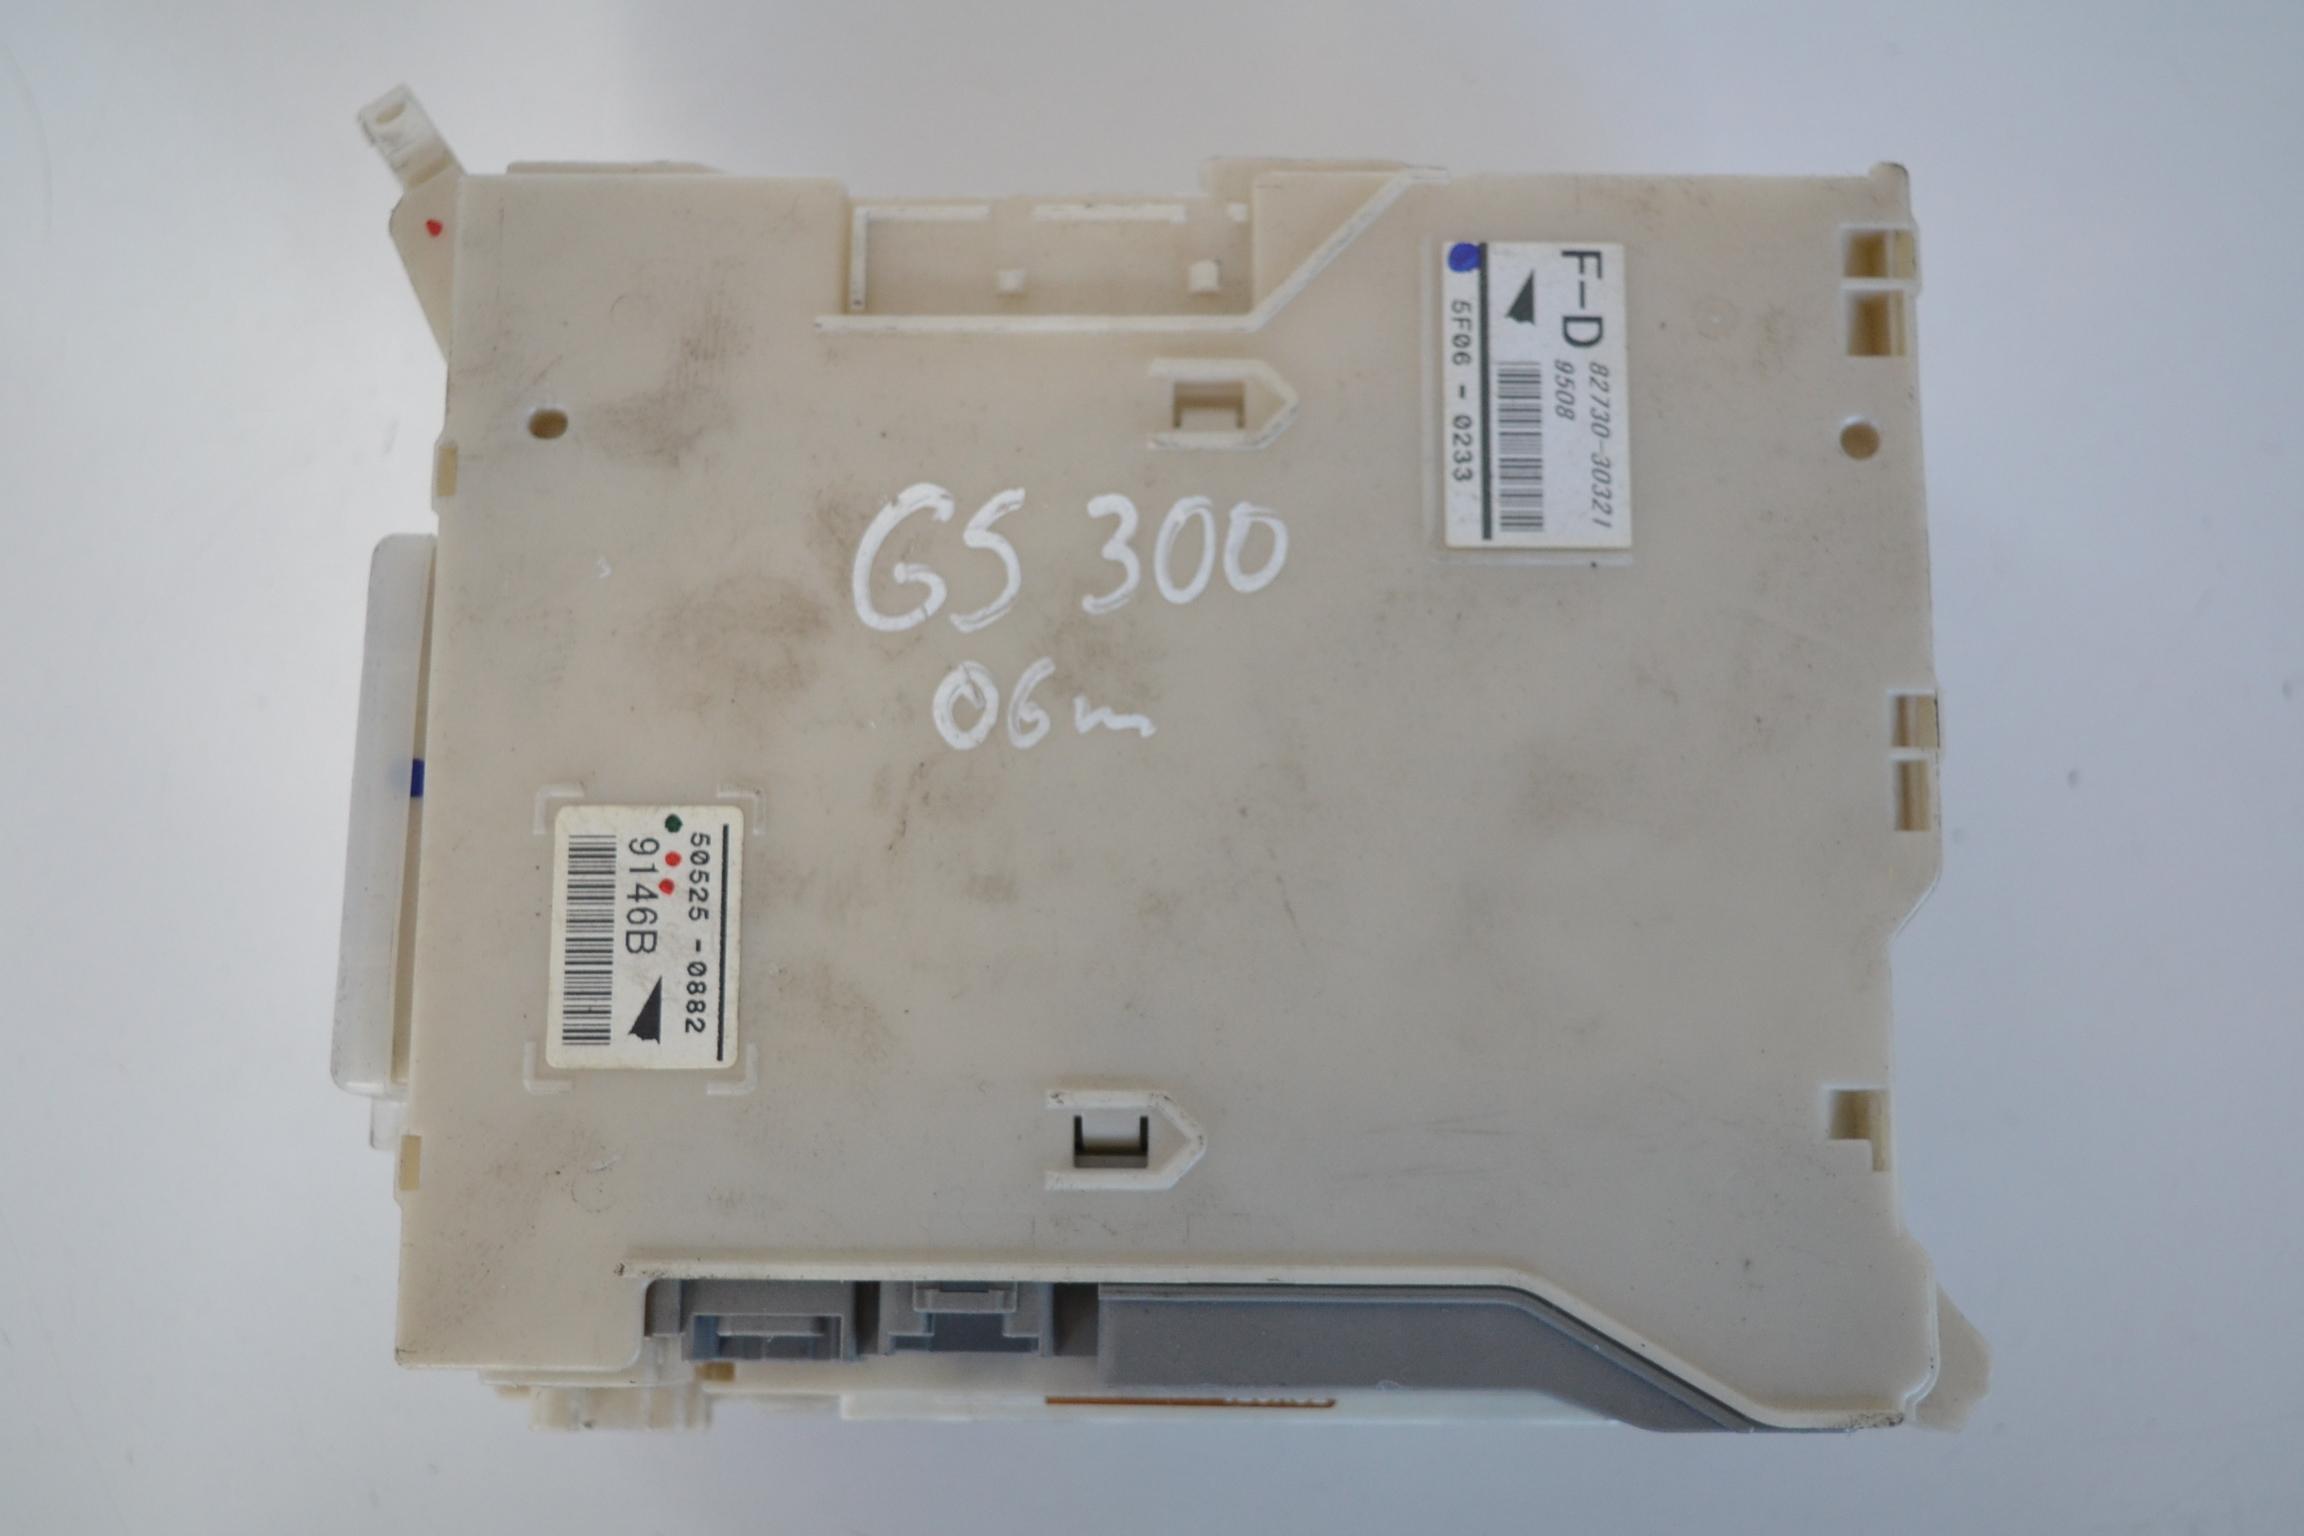 LEXUS GS III 2006 RHD INTERIOR DASH FUSE BOX 82730-30321